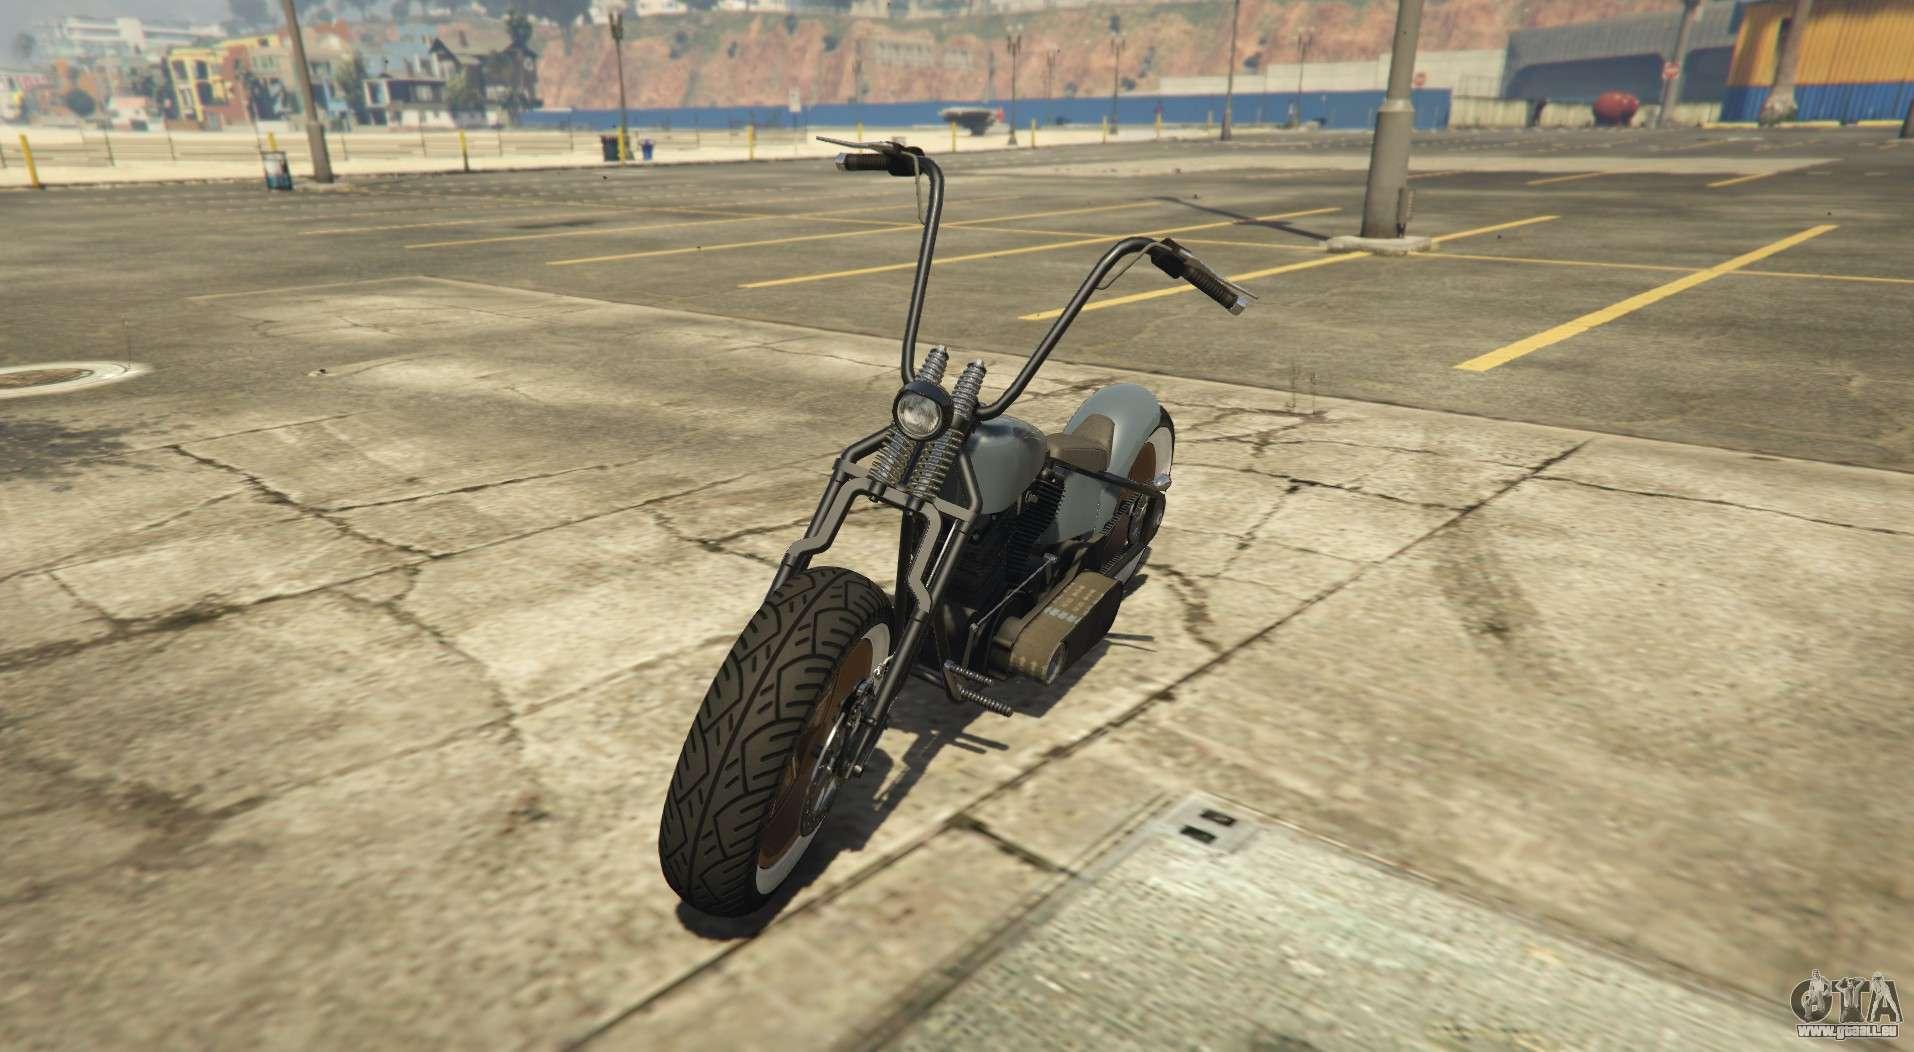 Western Zombie Bobber - bobber variation de la Zombie Chopper